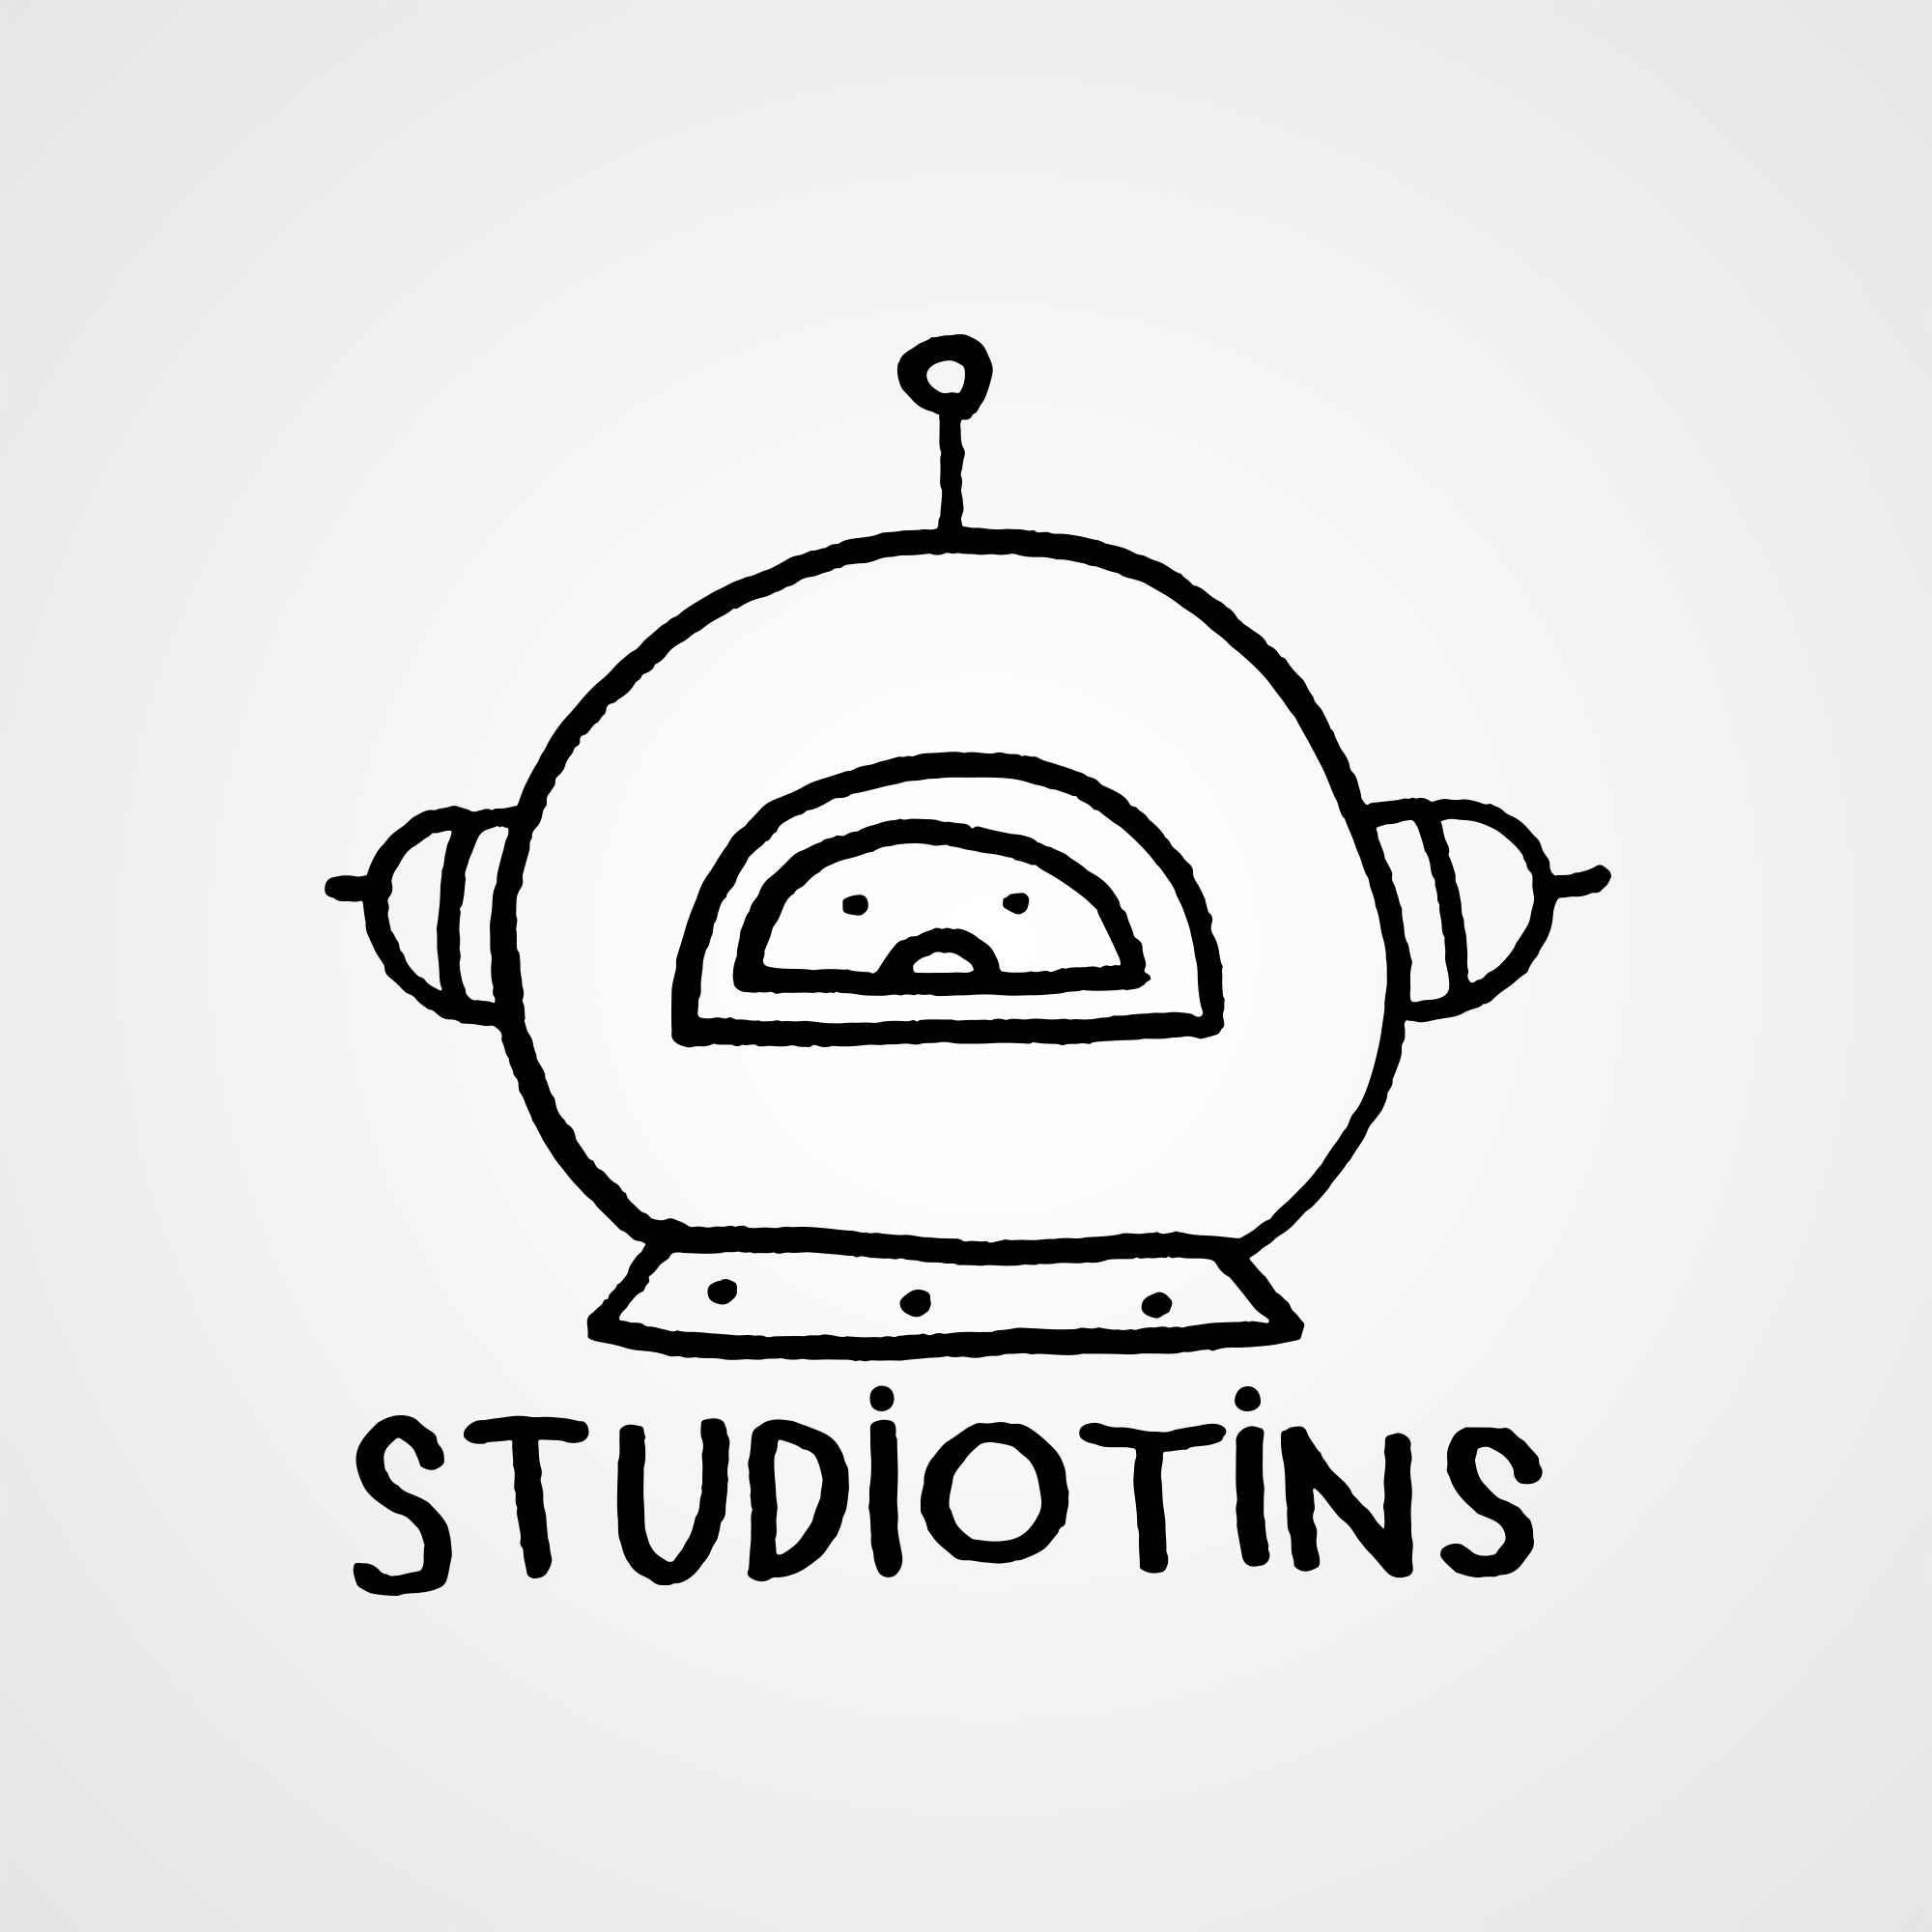 Studiotins